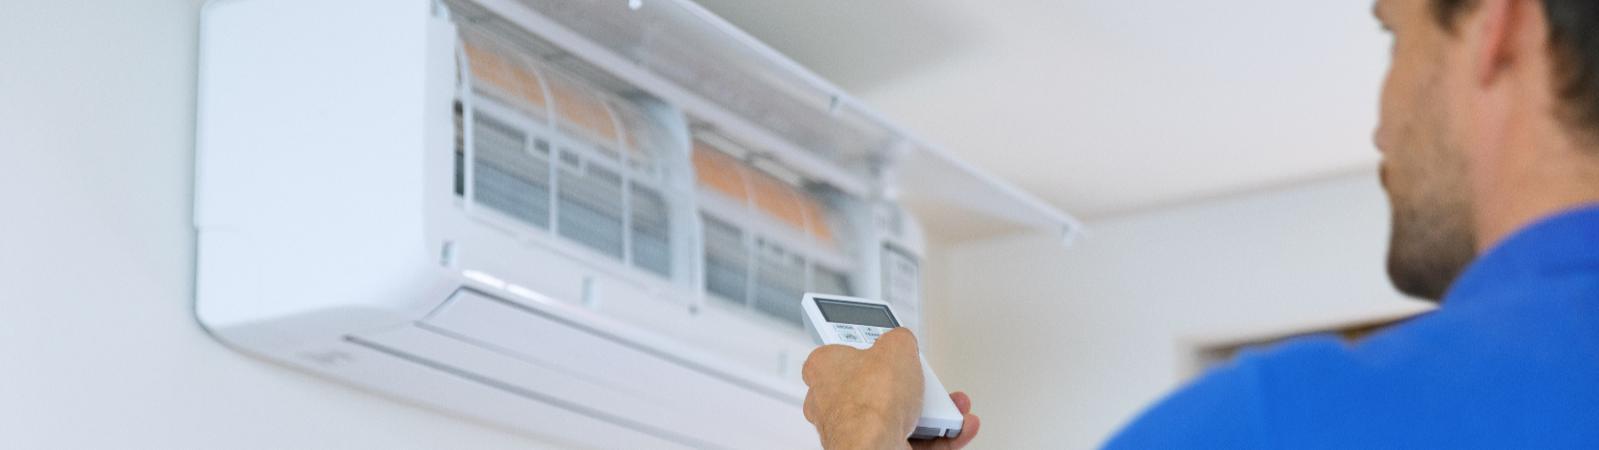 Handwerker installiert Klimagerät